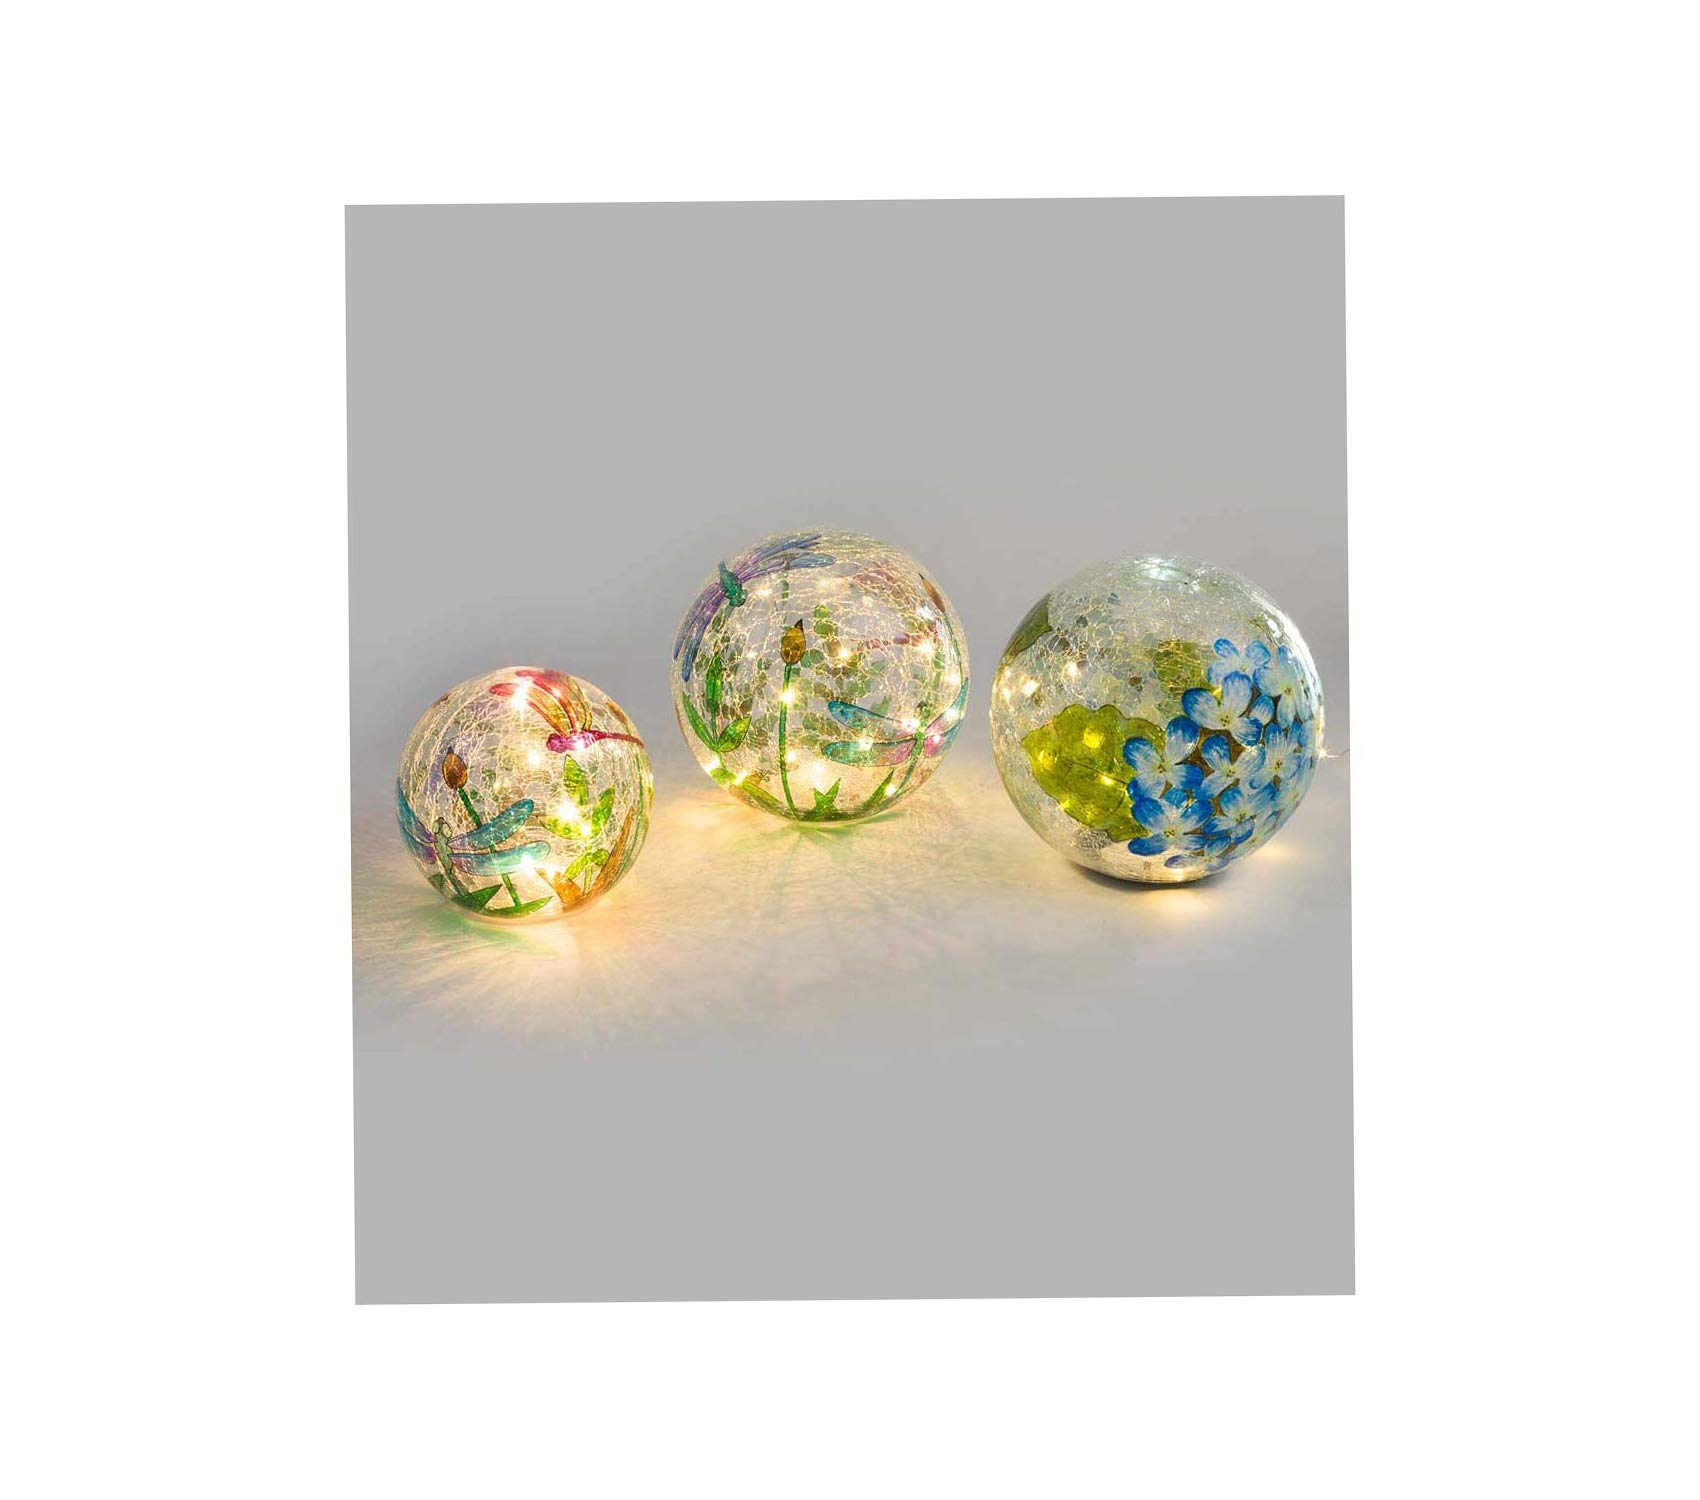 Outdoor Garden Backyard Décor Crackle-Glass Balls, Set of 3 Yard Art, Multi-Colored